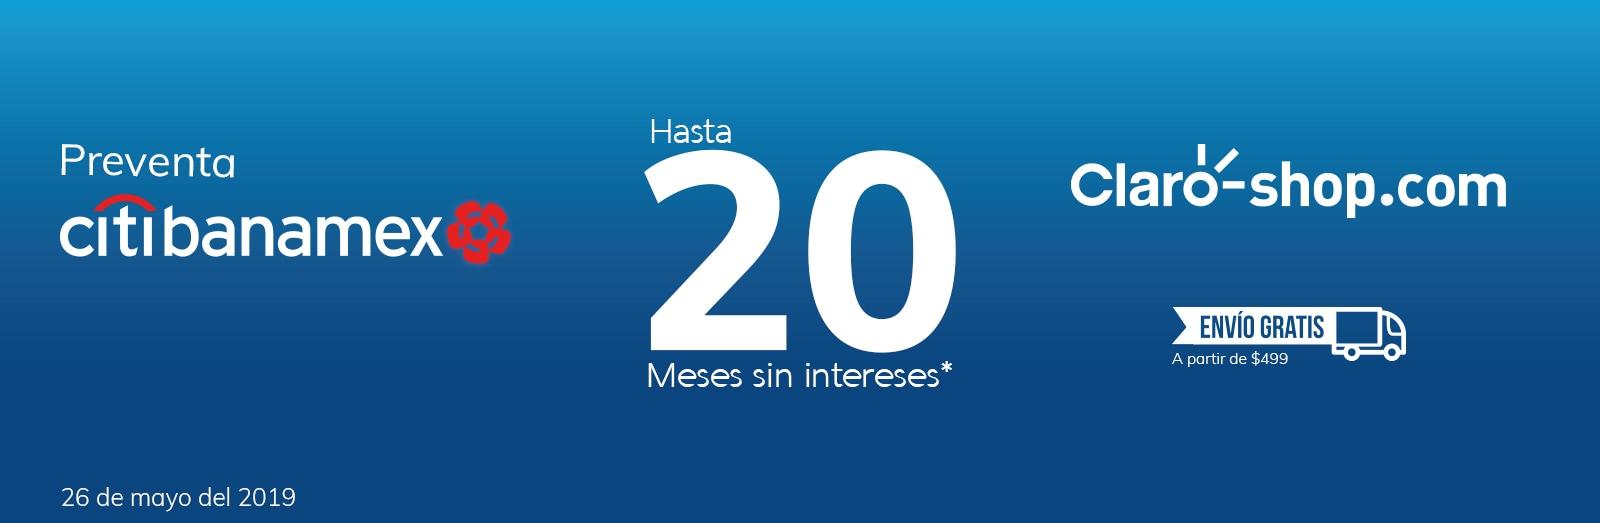 imagen del banner a  https://resources.claroshop.com/medios-plazavip/publicidad/5ce8669aa1593_citibanamex-leaderjpg.jpg